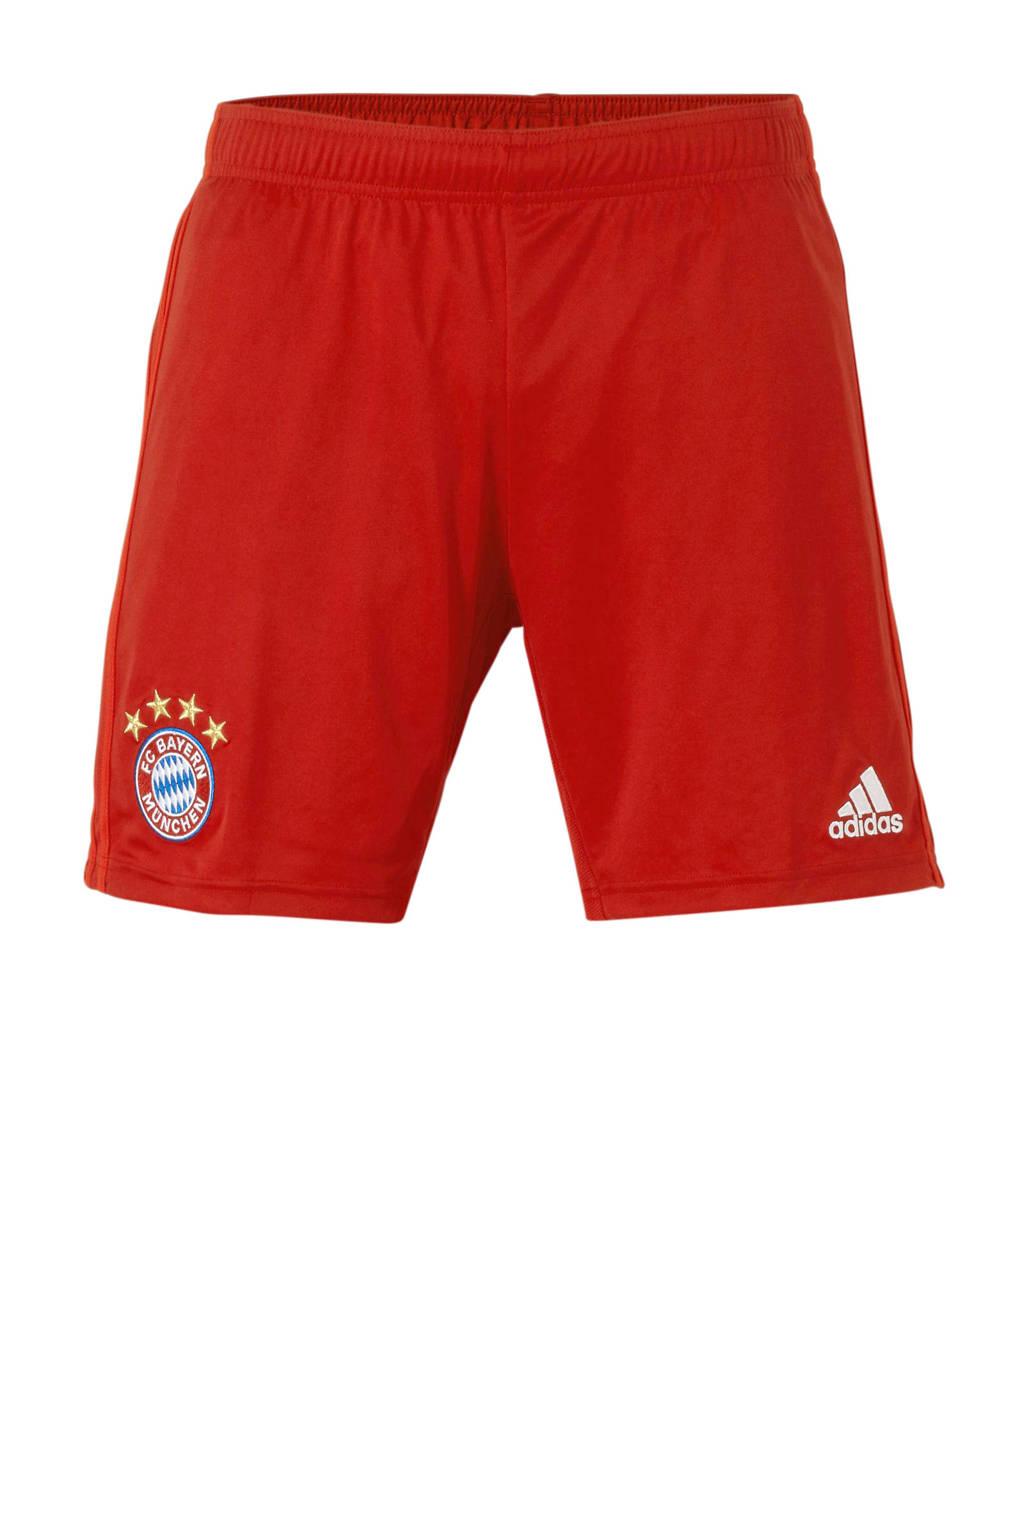 adidas Senior FC Bayern München voetbalshort Thuis, Rood